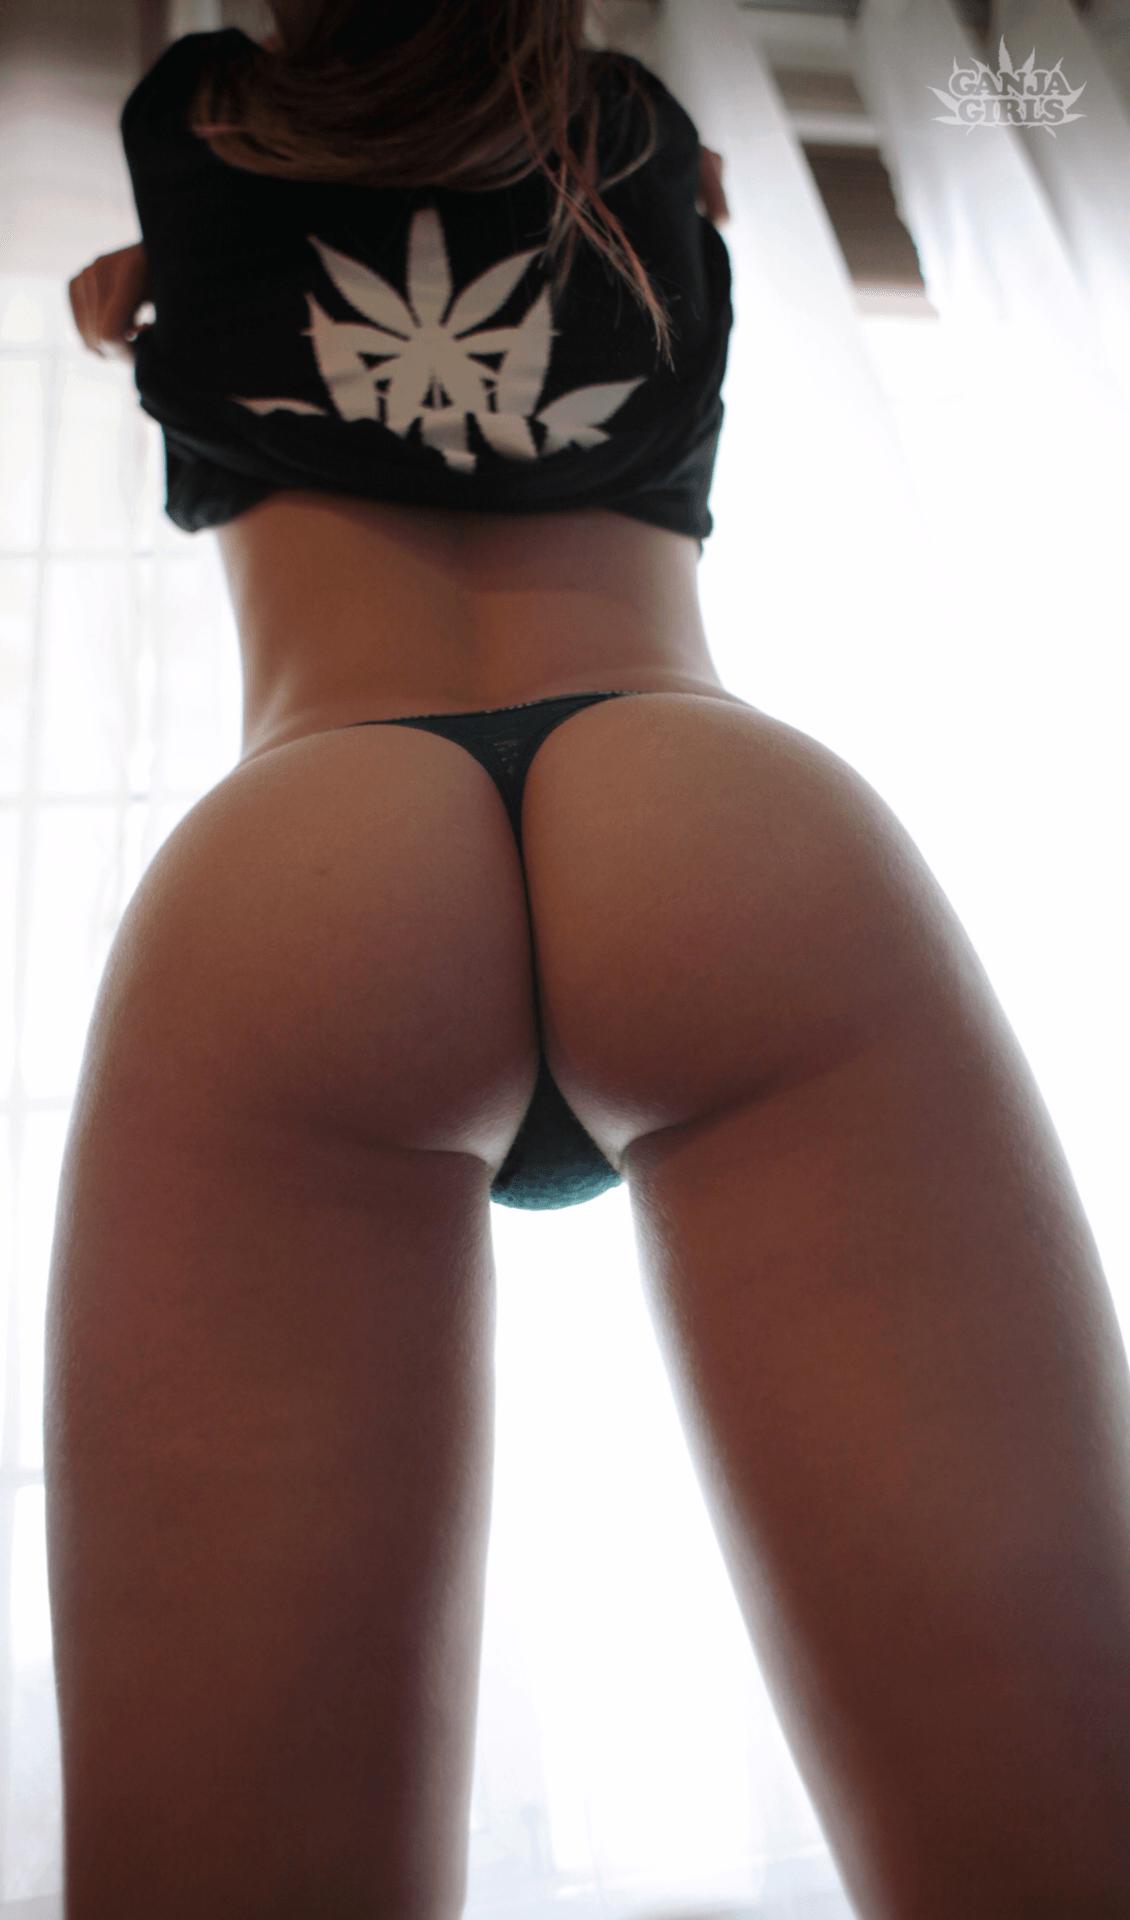 Sexy ass of the week